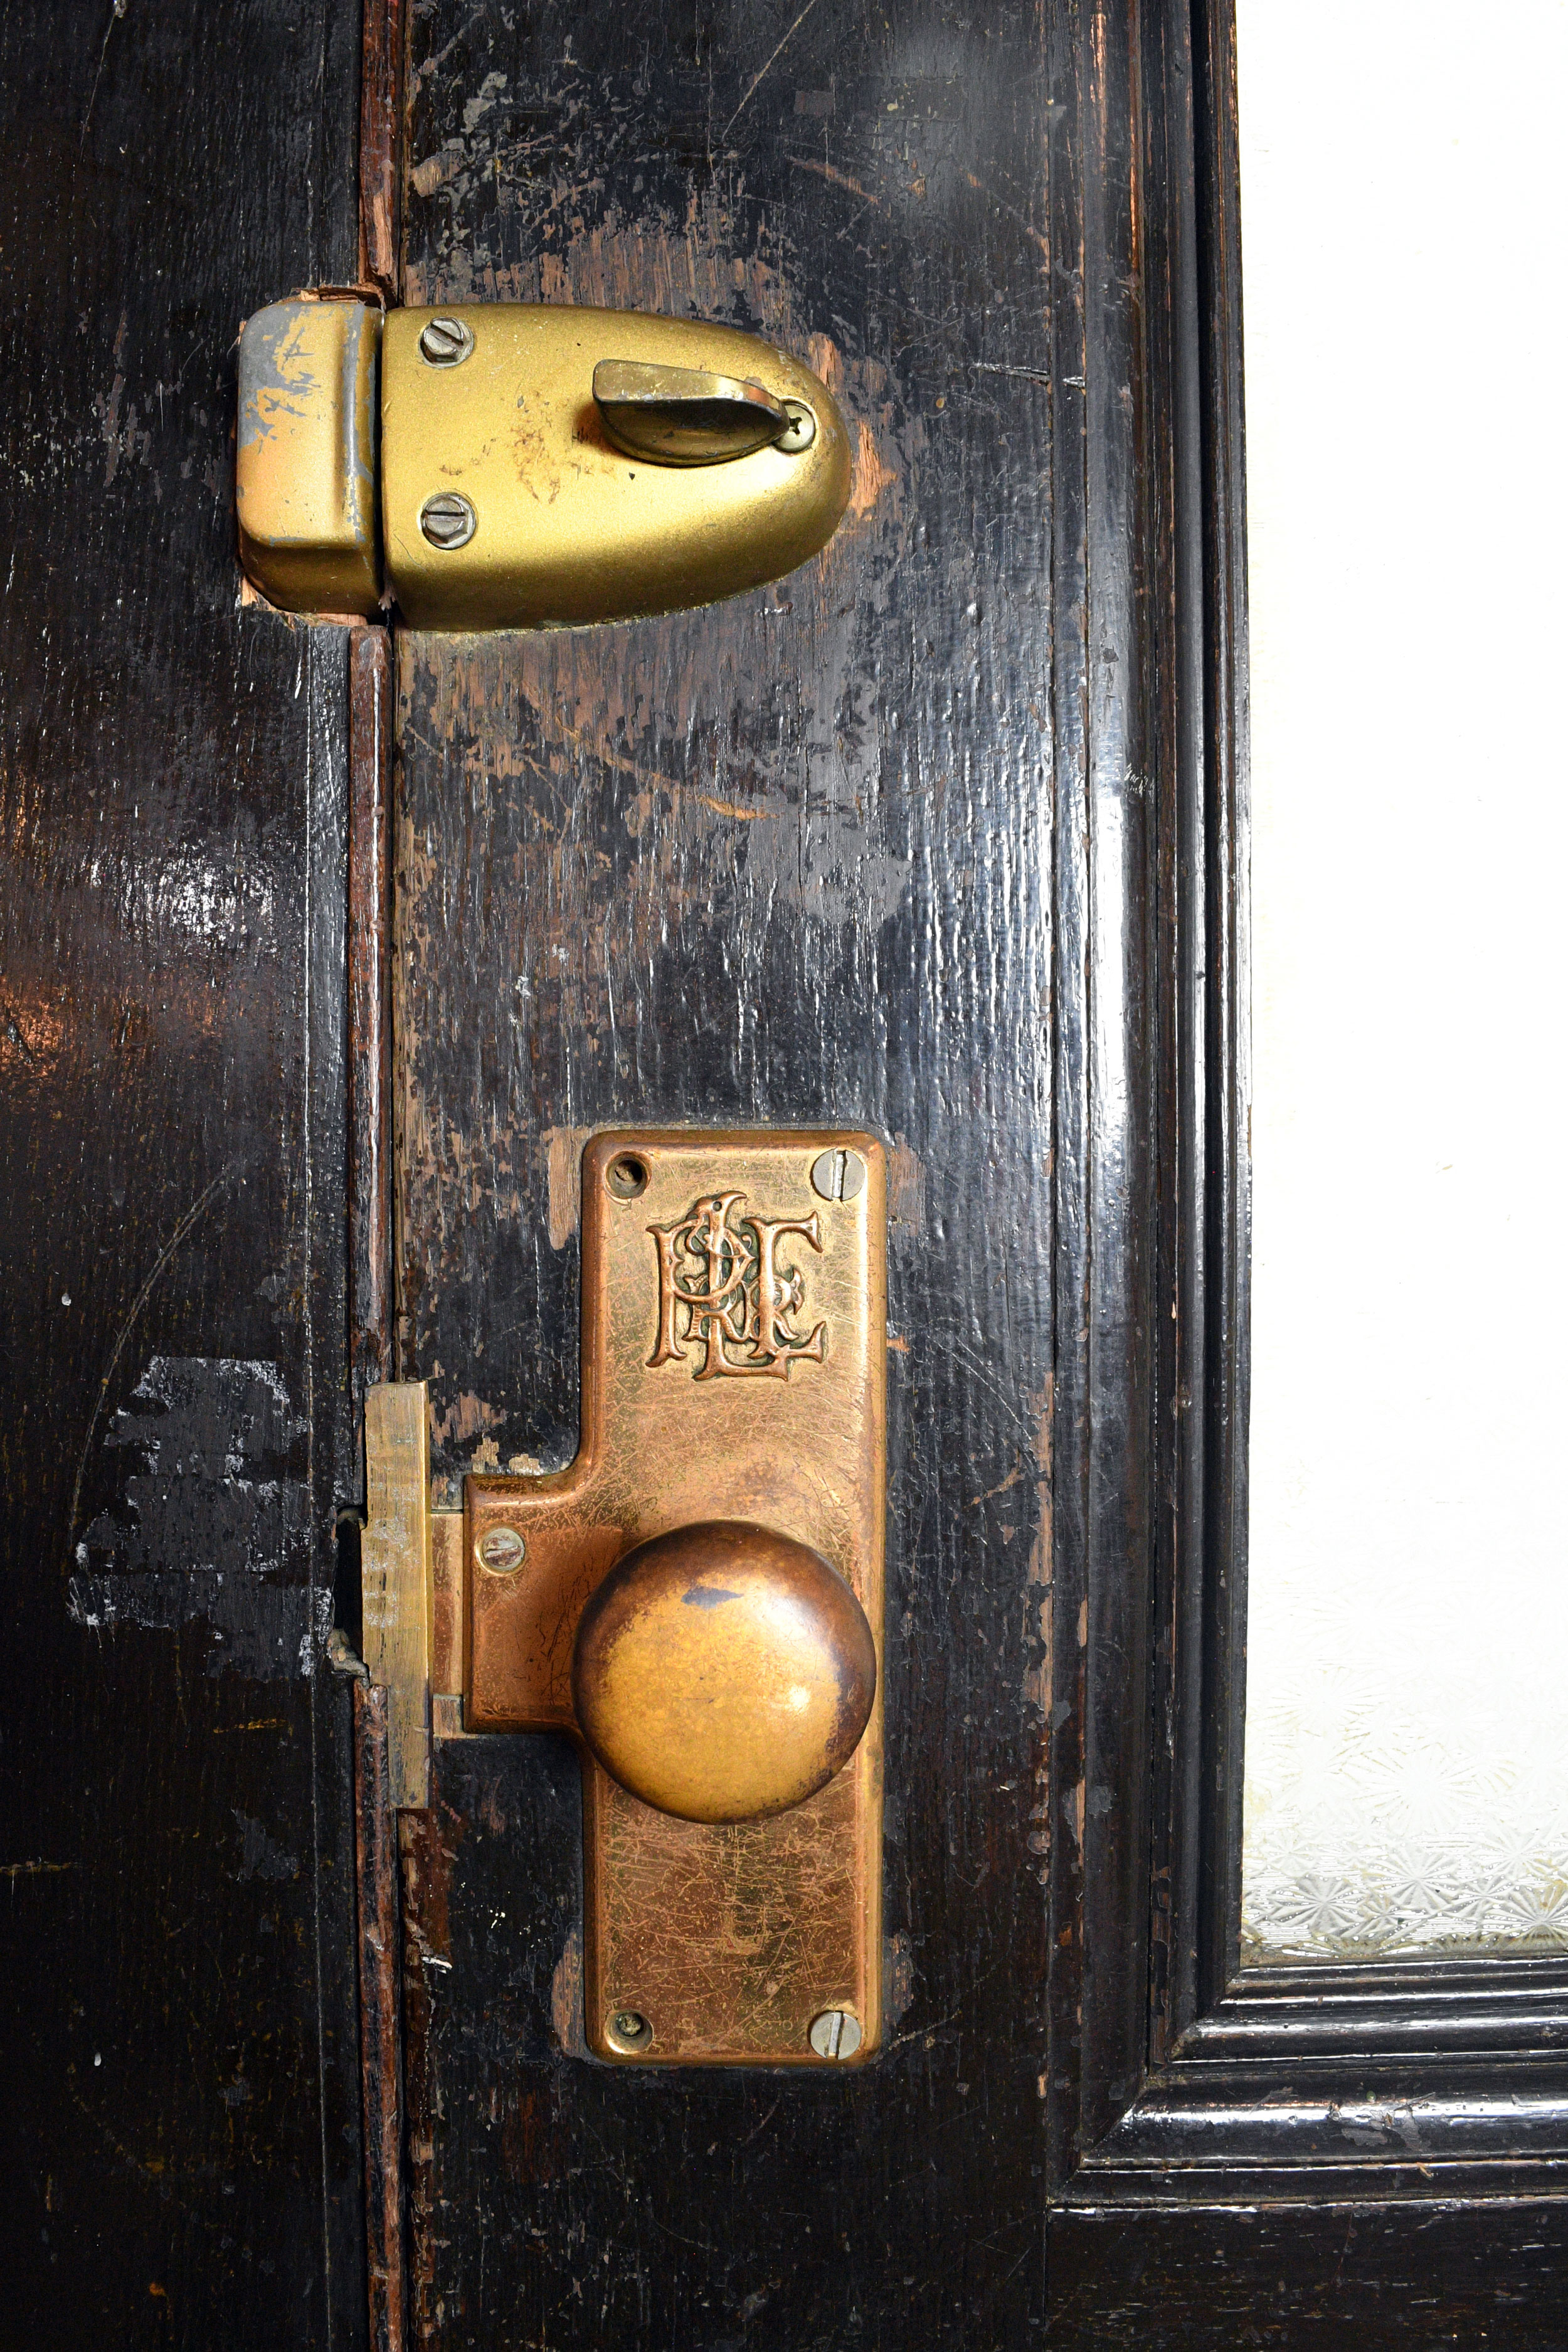 47932-ple-railroad-double-doors-handle-lock.jpg